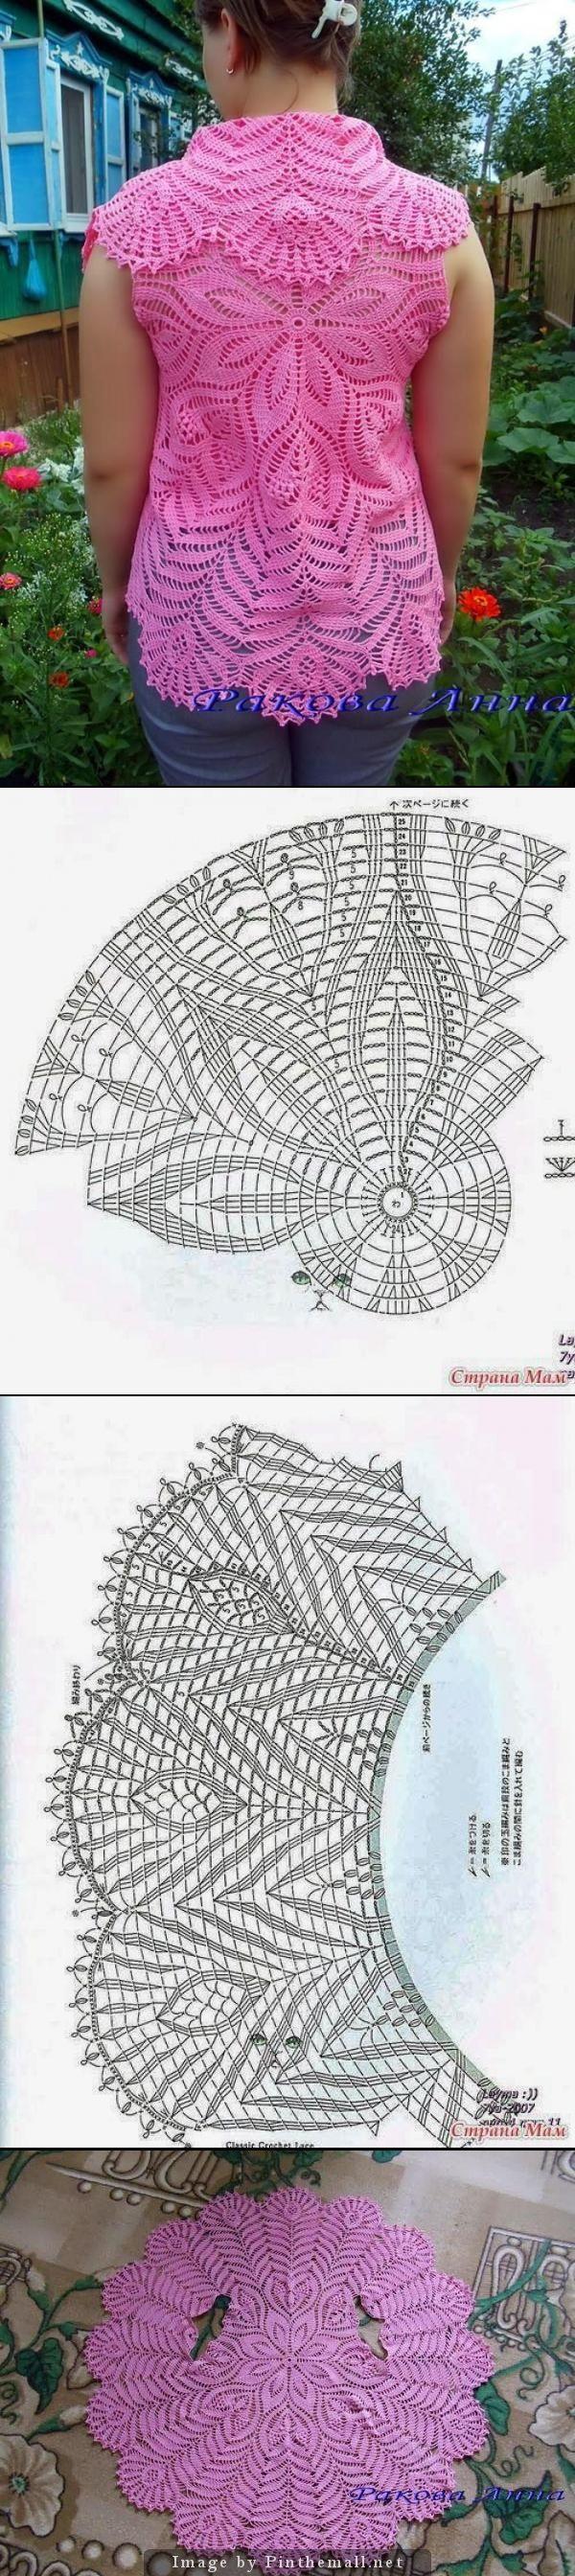 Crochet lace circular vest ~~ | Kreisjacke | Pinterest | Häkelspitze ...